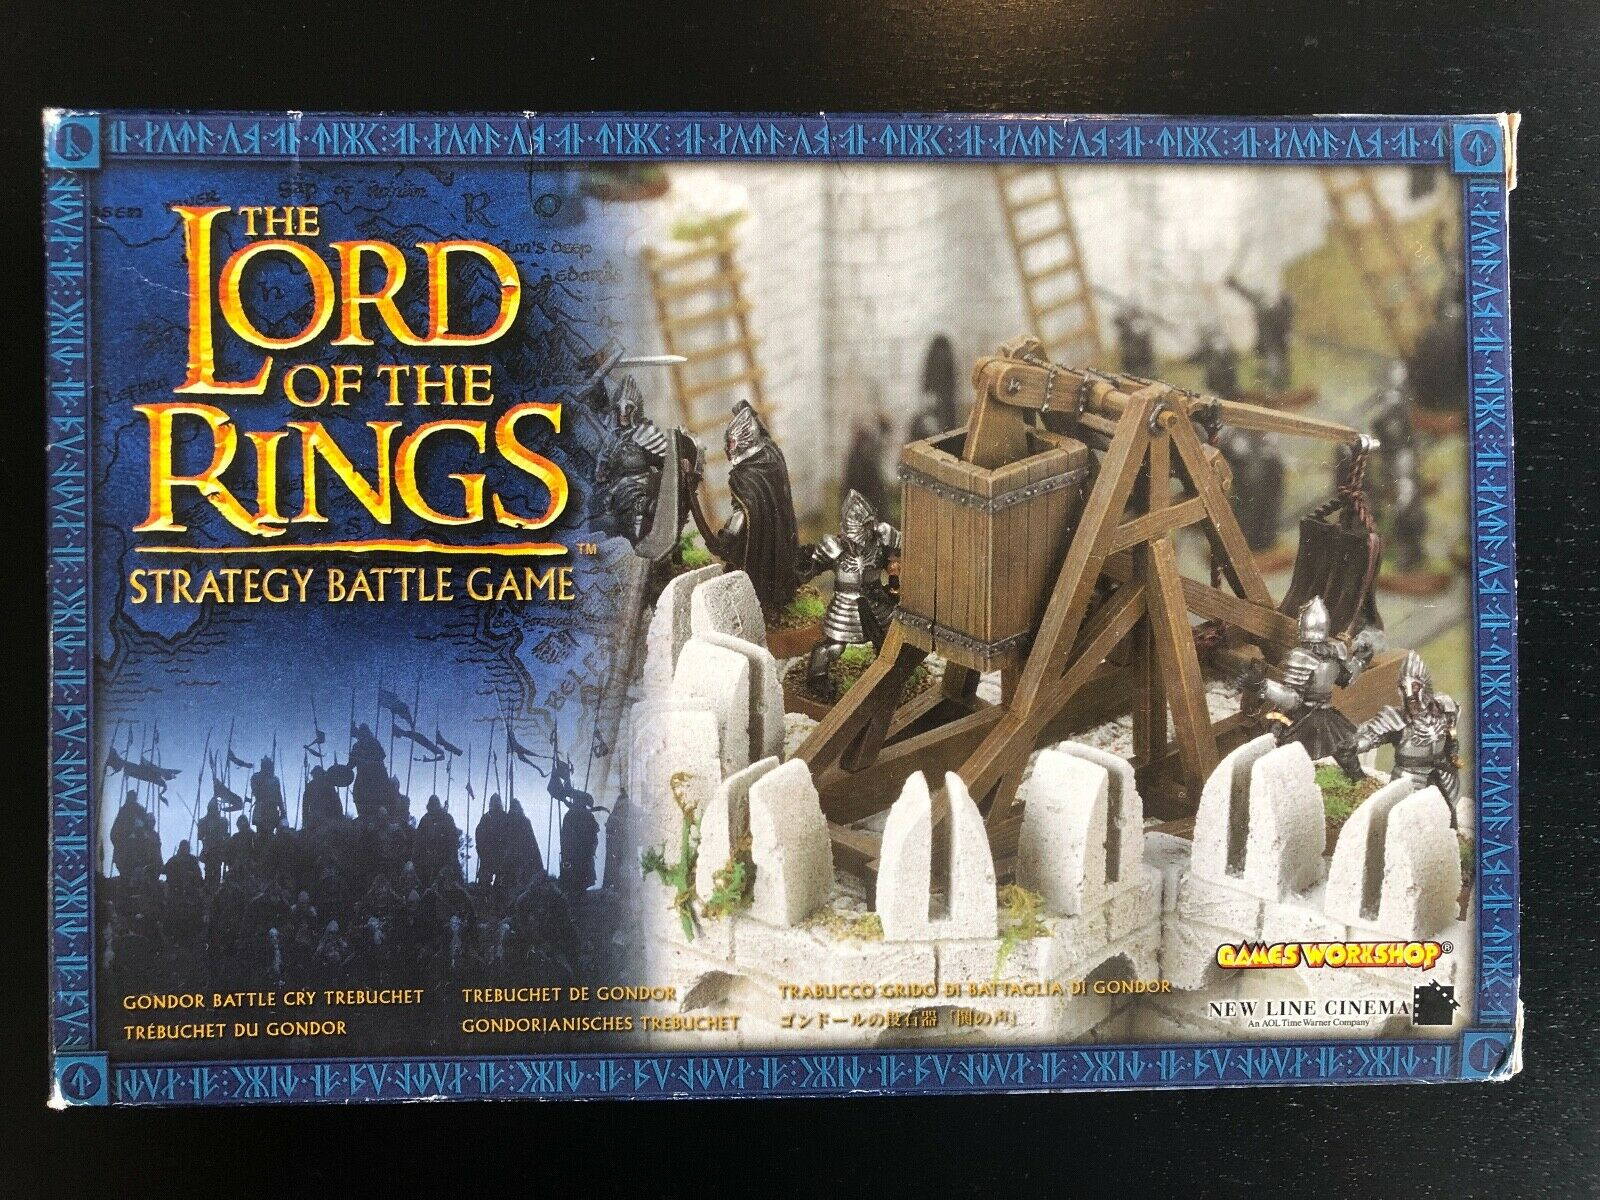 Gondor Battlecry Trebuchet LOTR Metal Strategy Battle Tolkien Lord of the Rings